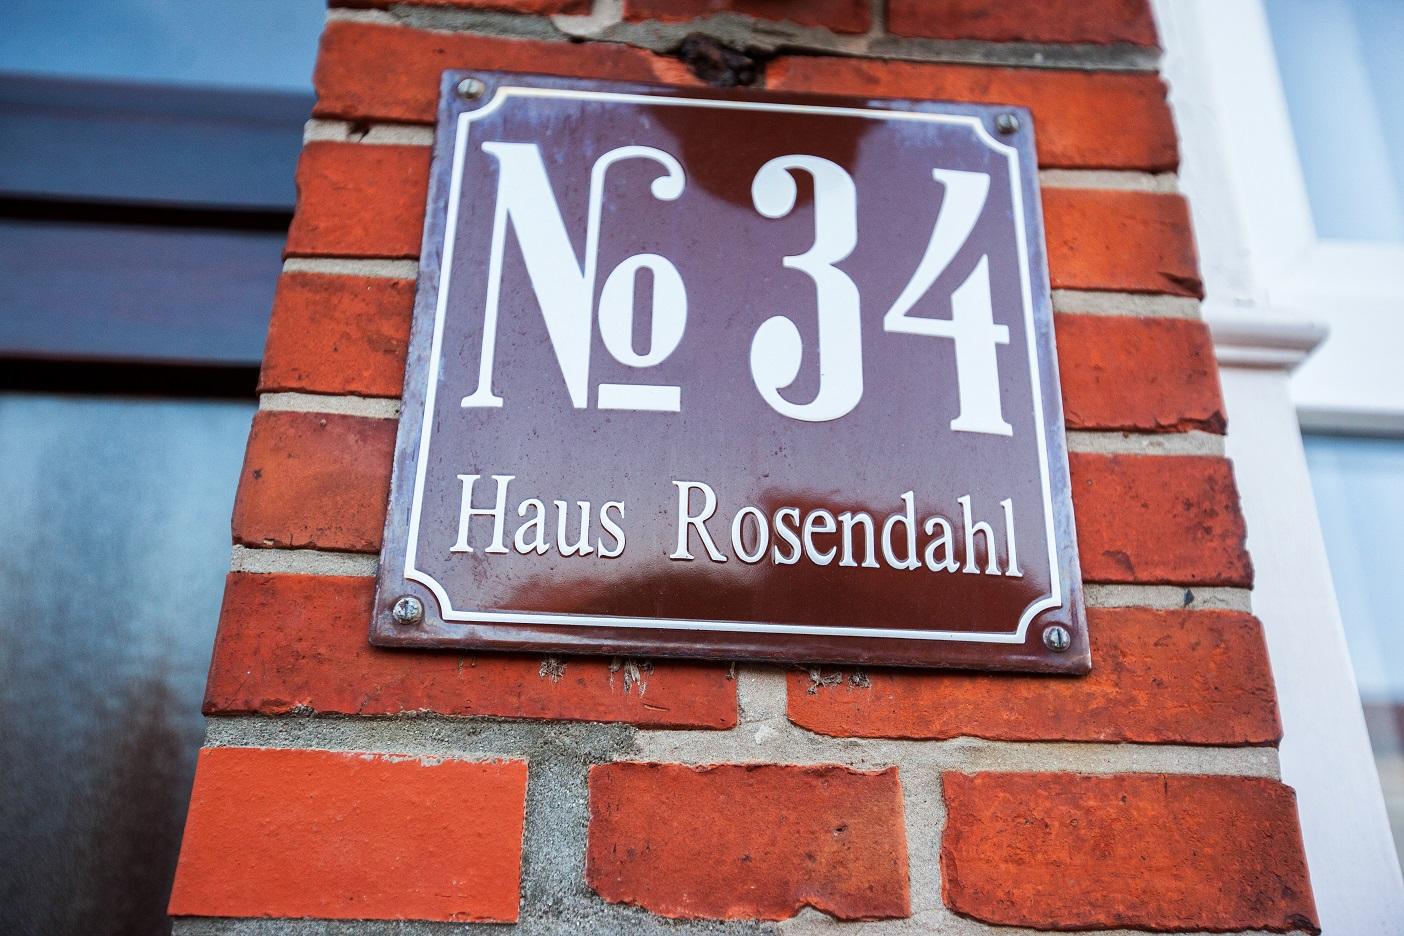 Haus Rosendahl